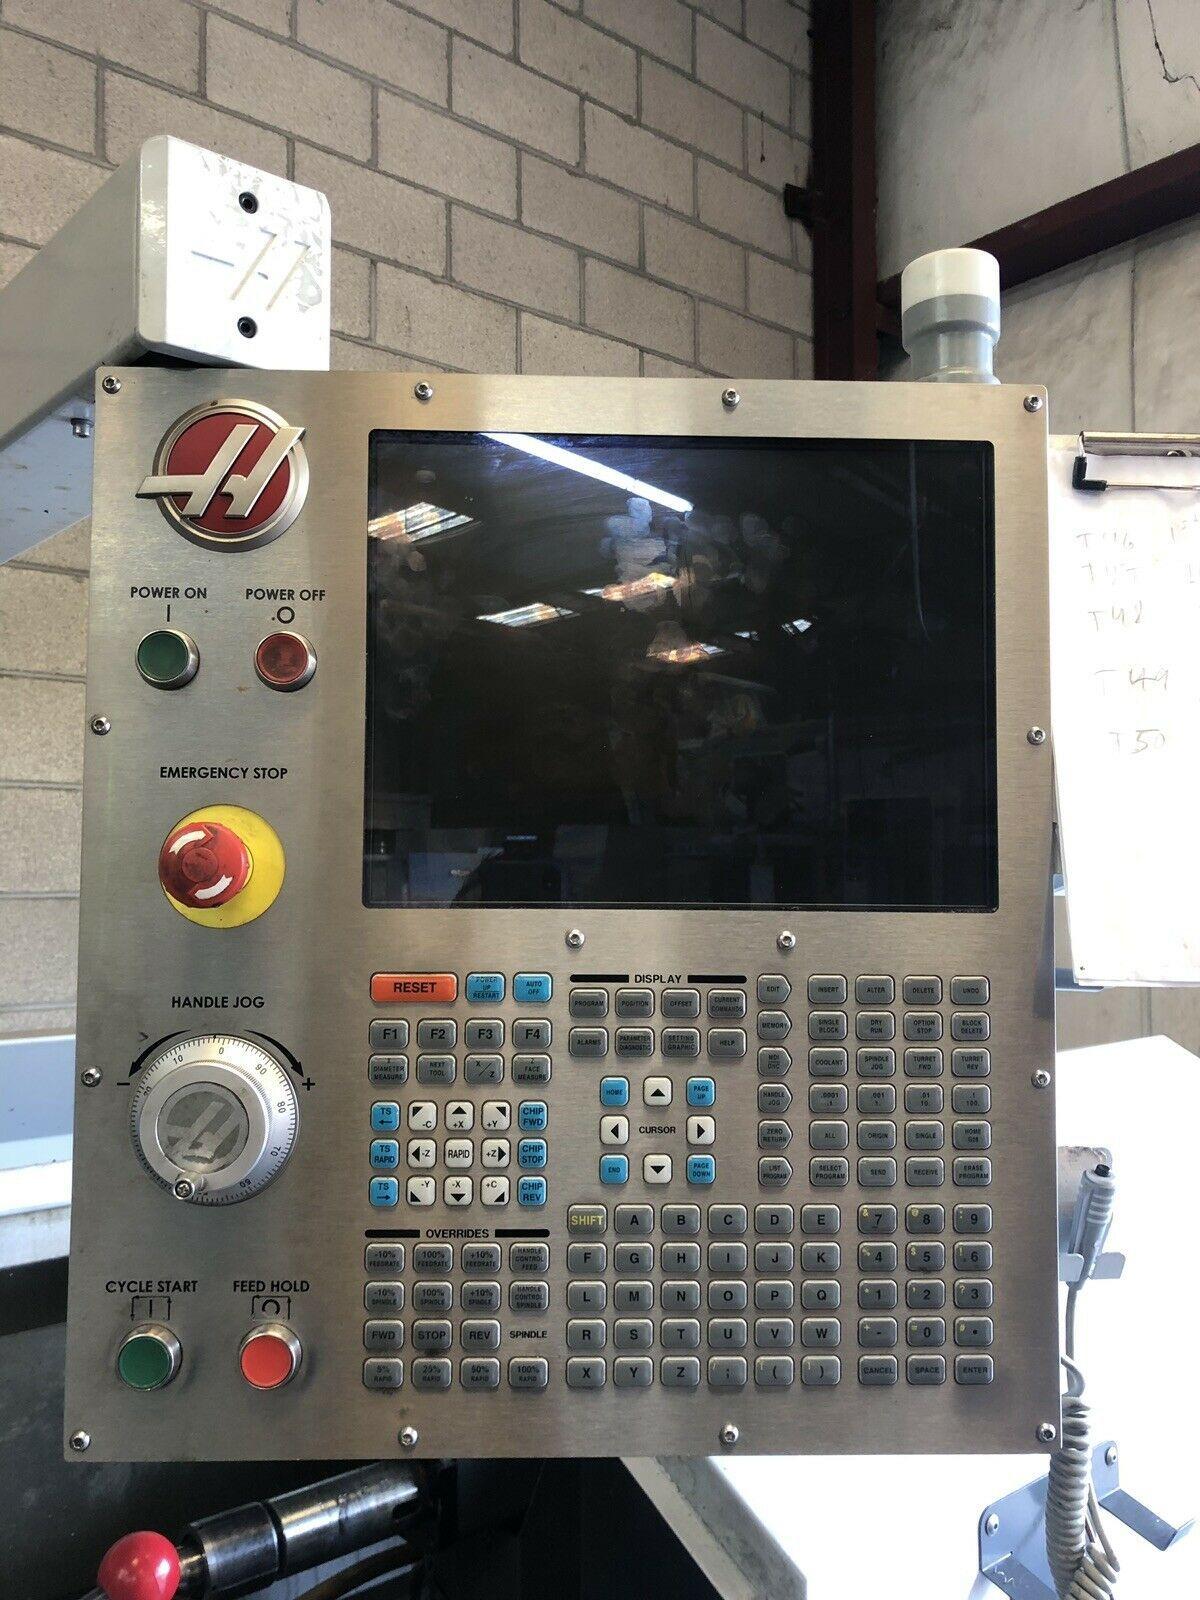 CNC Lathe For Sale - Used CNC Lathe Machines - CNCMachines com